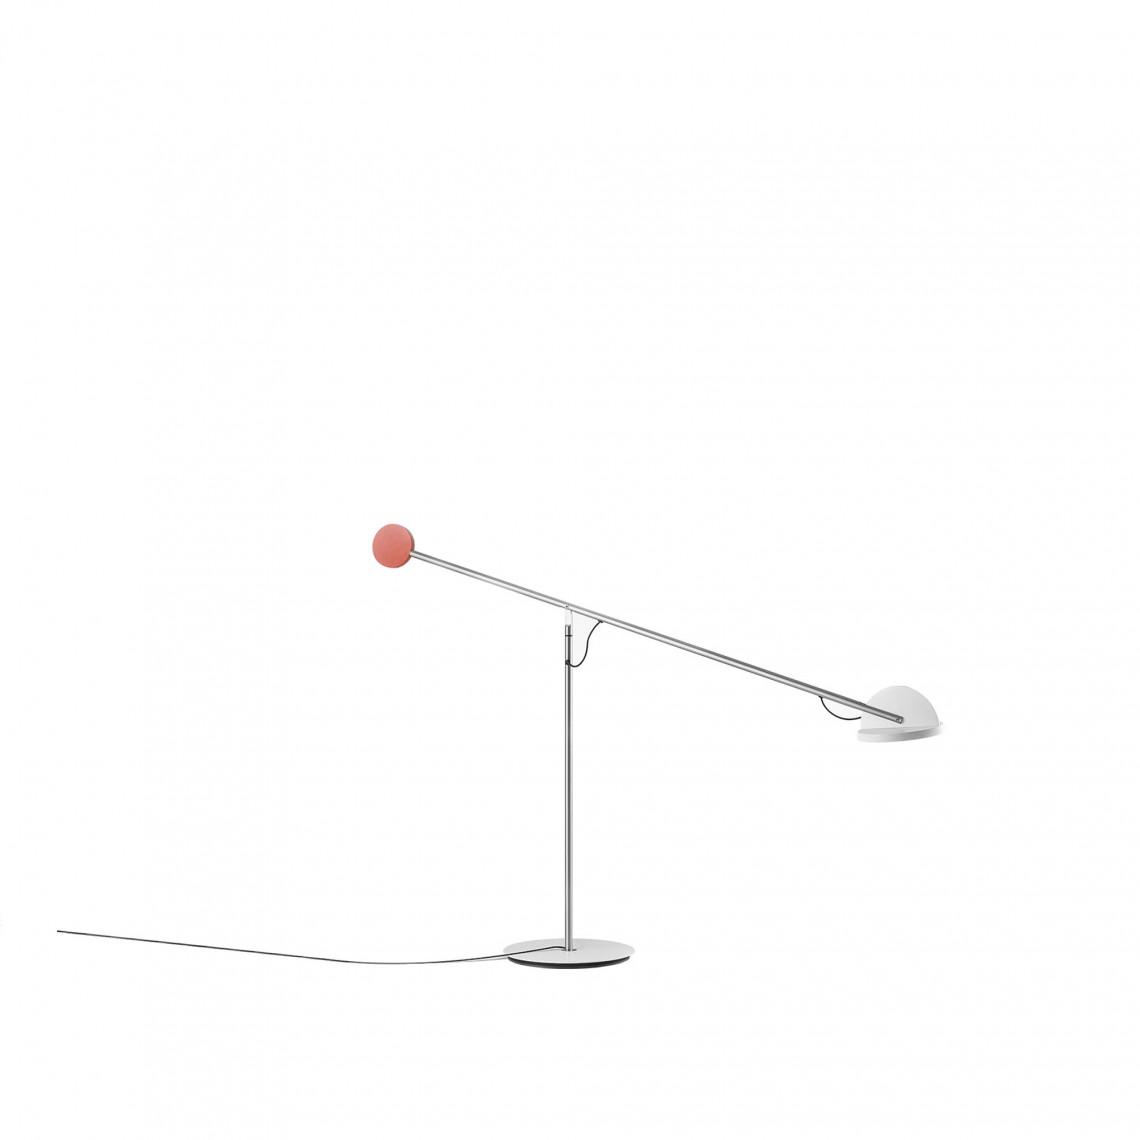 Copernica M - Table Lamp Red, White